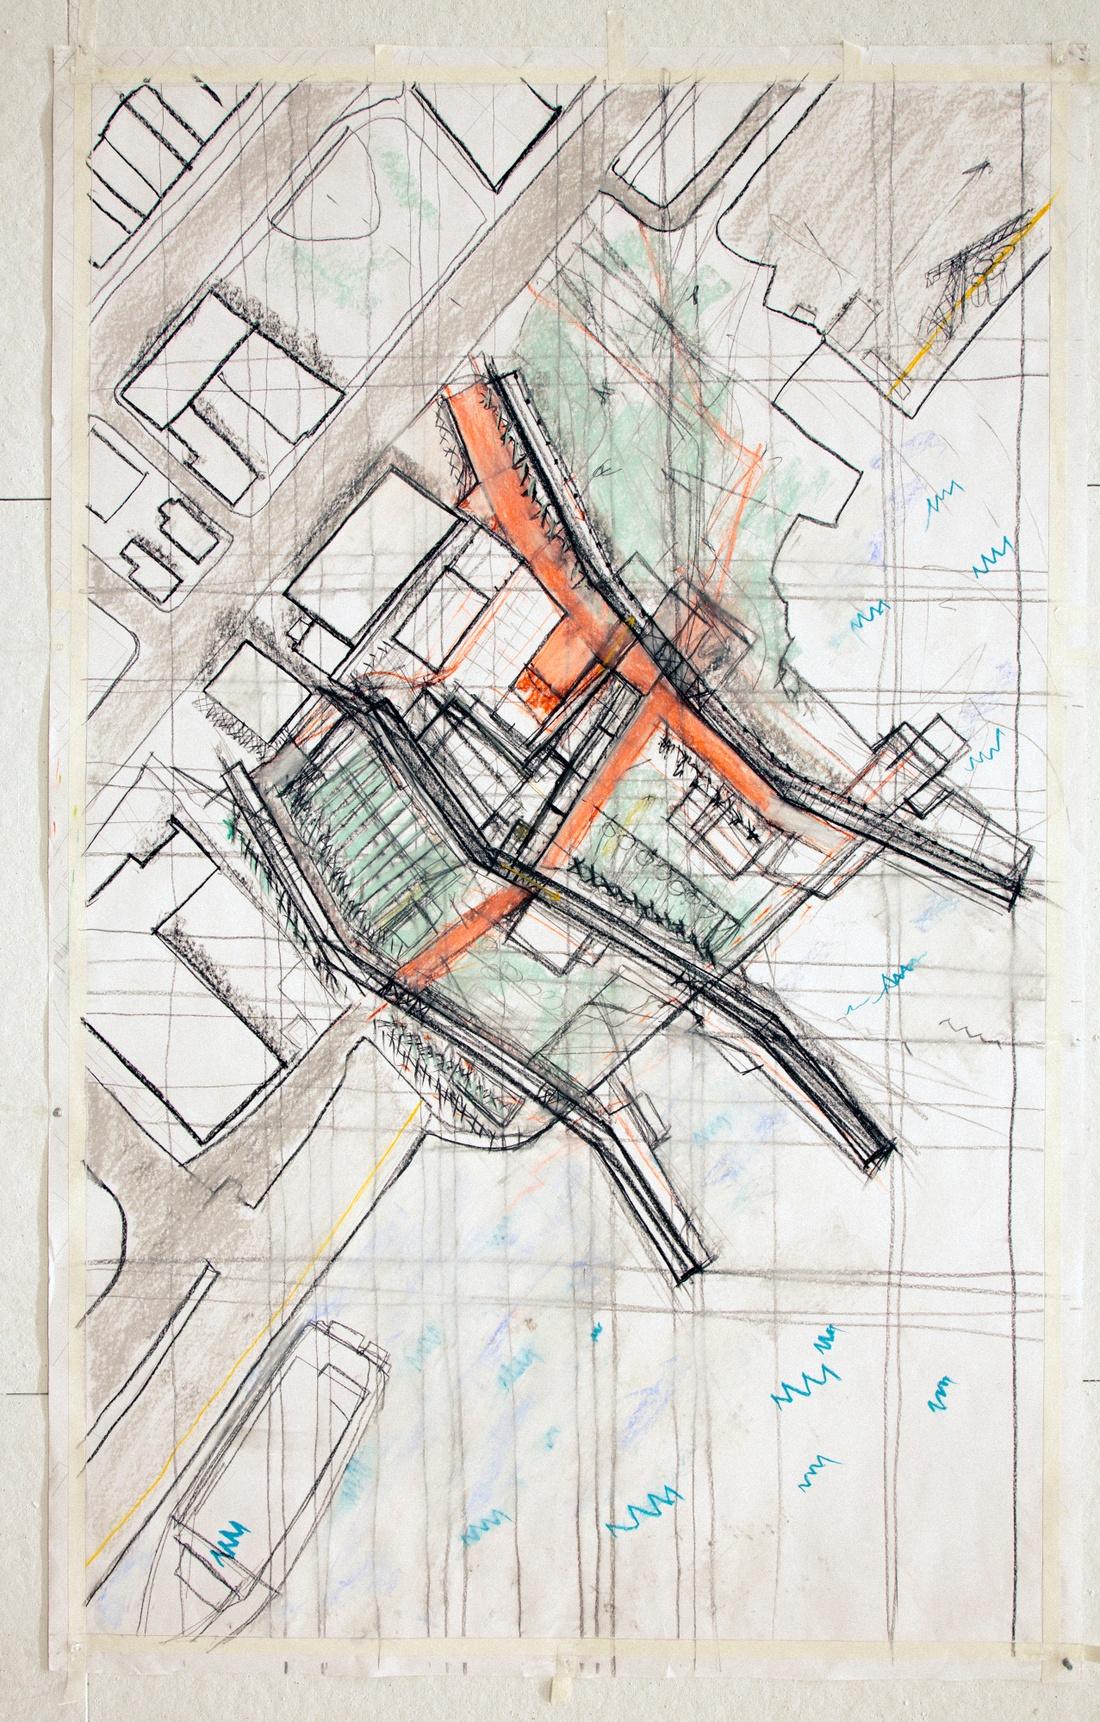 Plan drawing by Daniel Glick-Unterman.